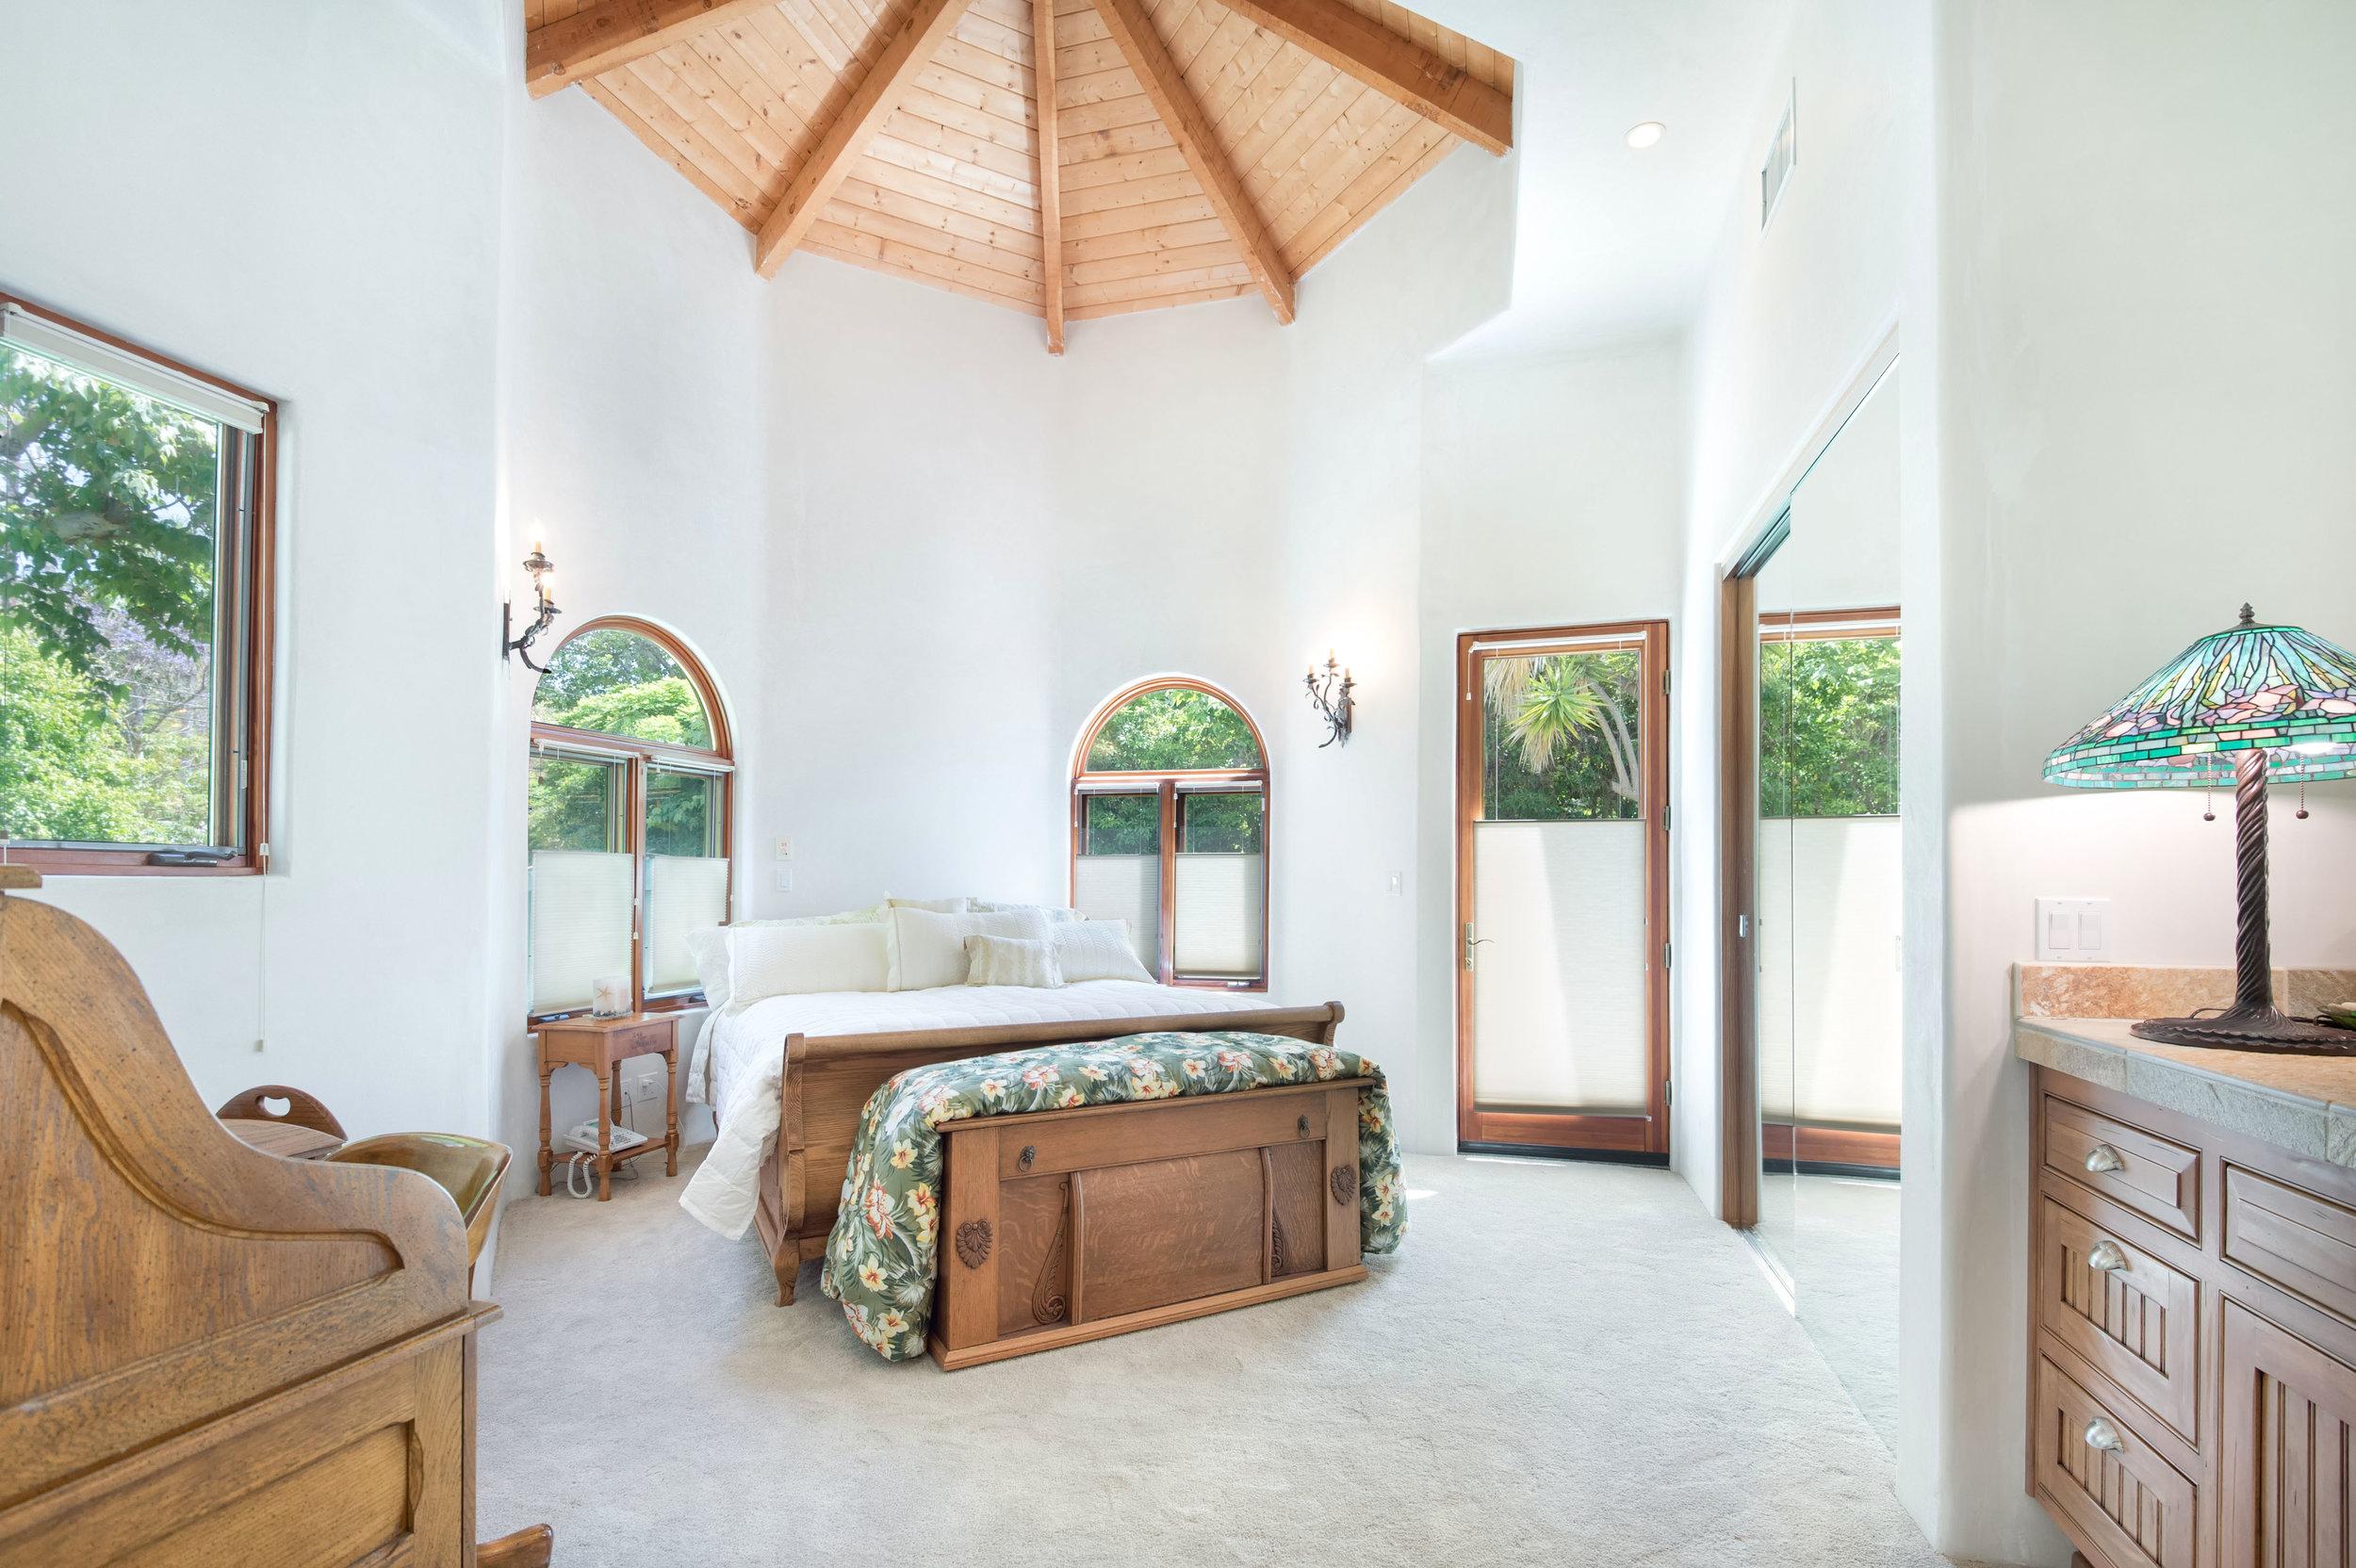 017 guest bedroom 6405 bonsall Malibu For Sale The Malibu Life Team Luxury Real Estate.jpg